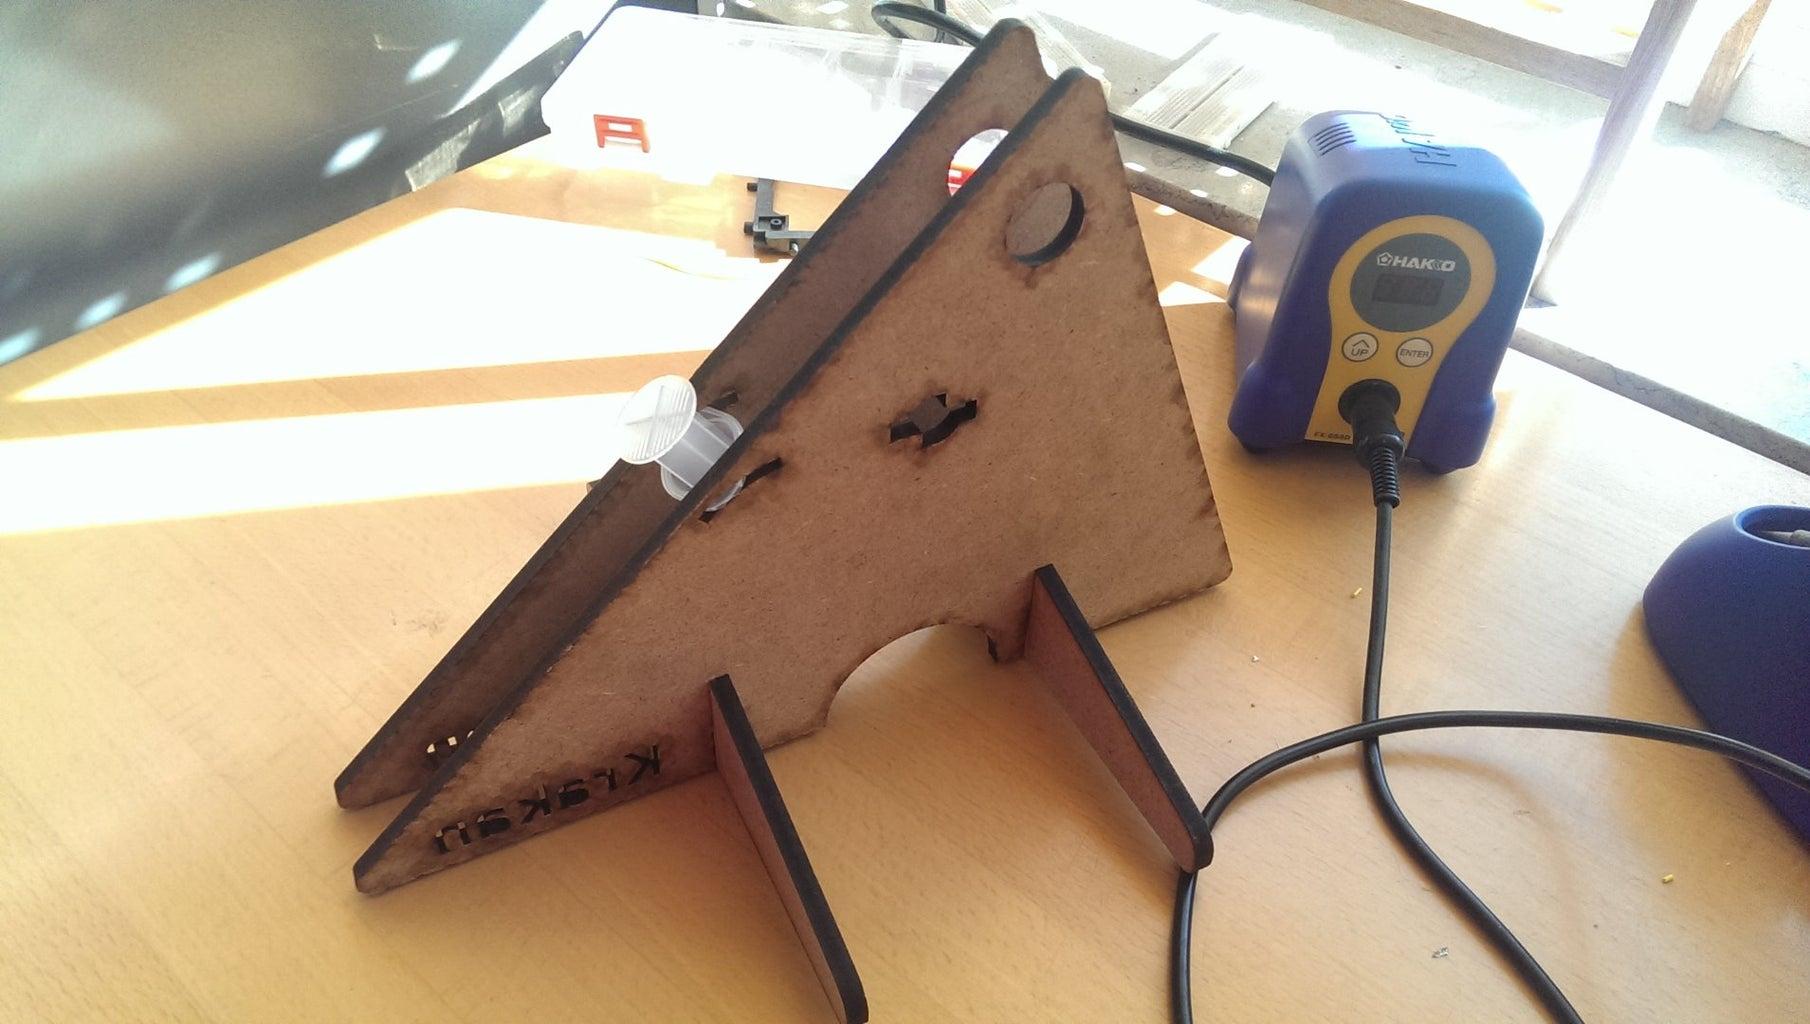 Assembling the Crane